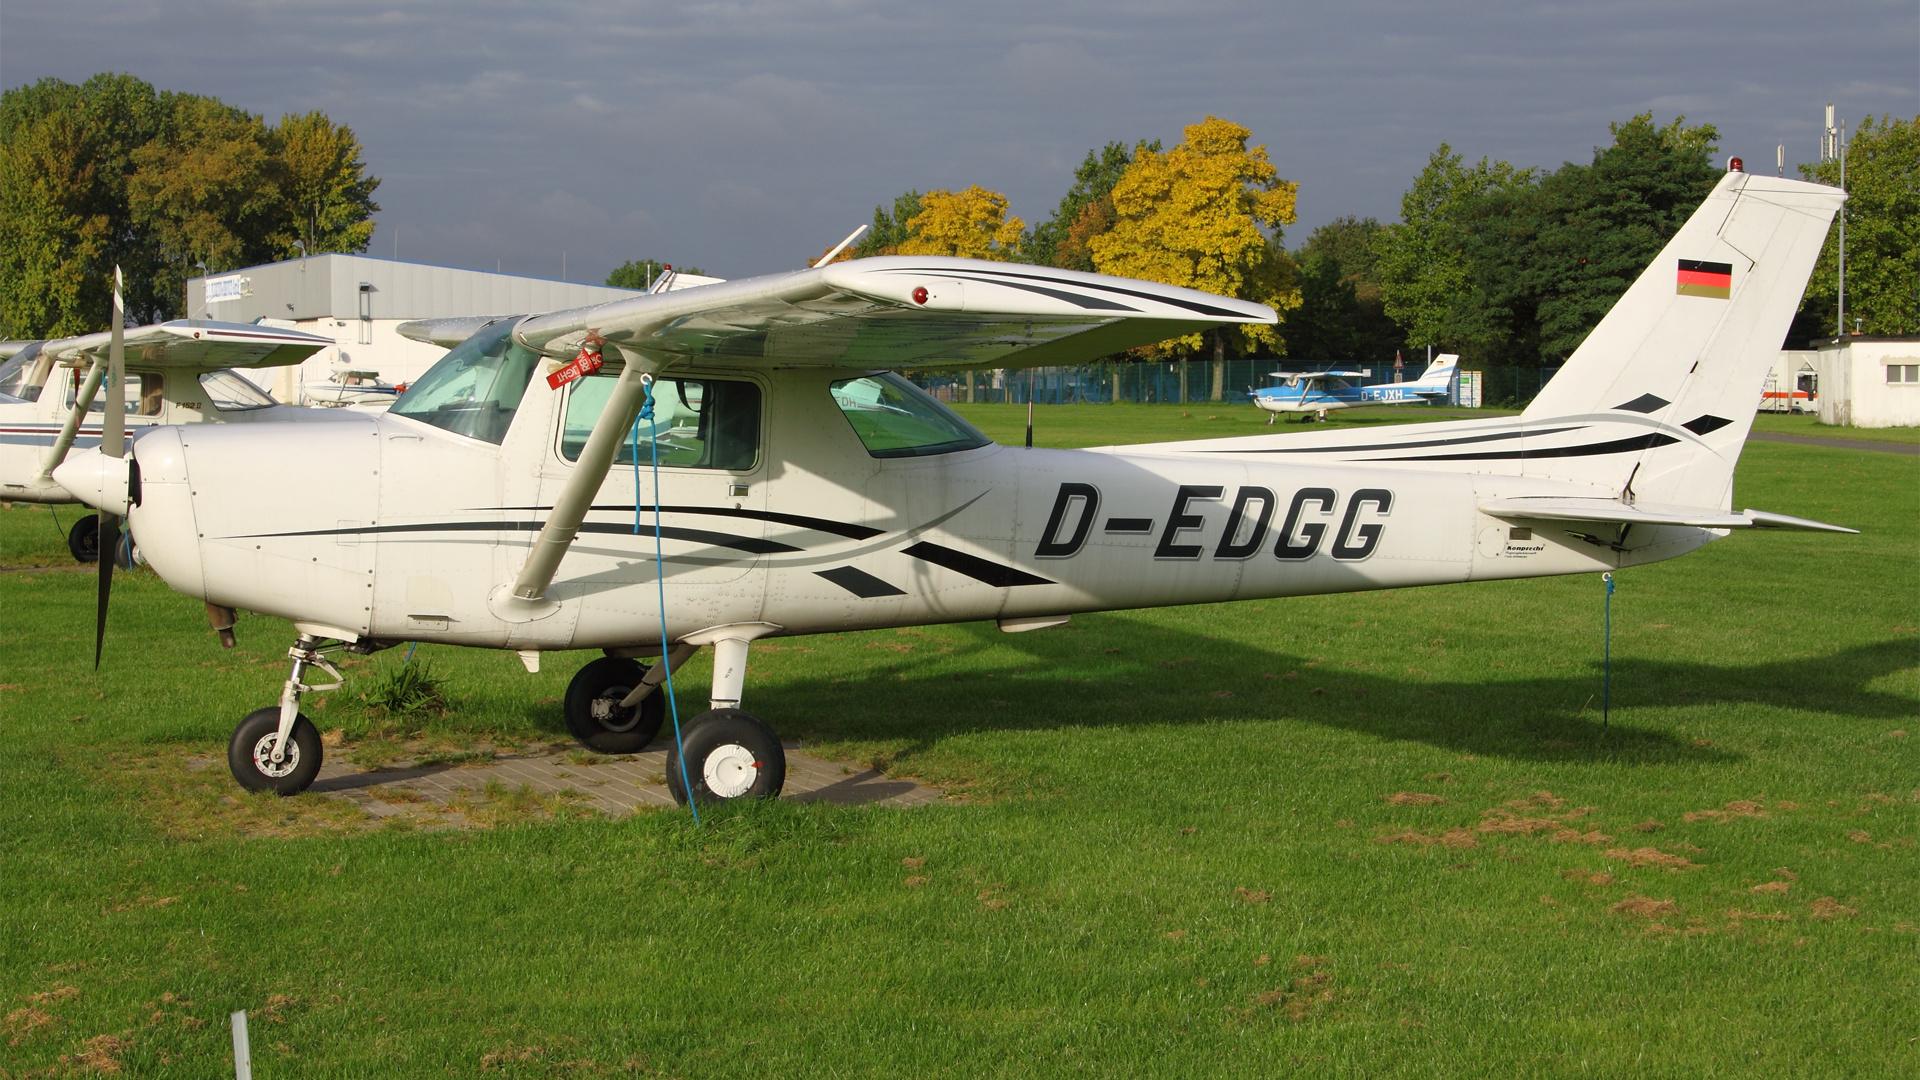 D-EDGG-1 C152 ESS 201109